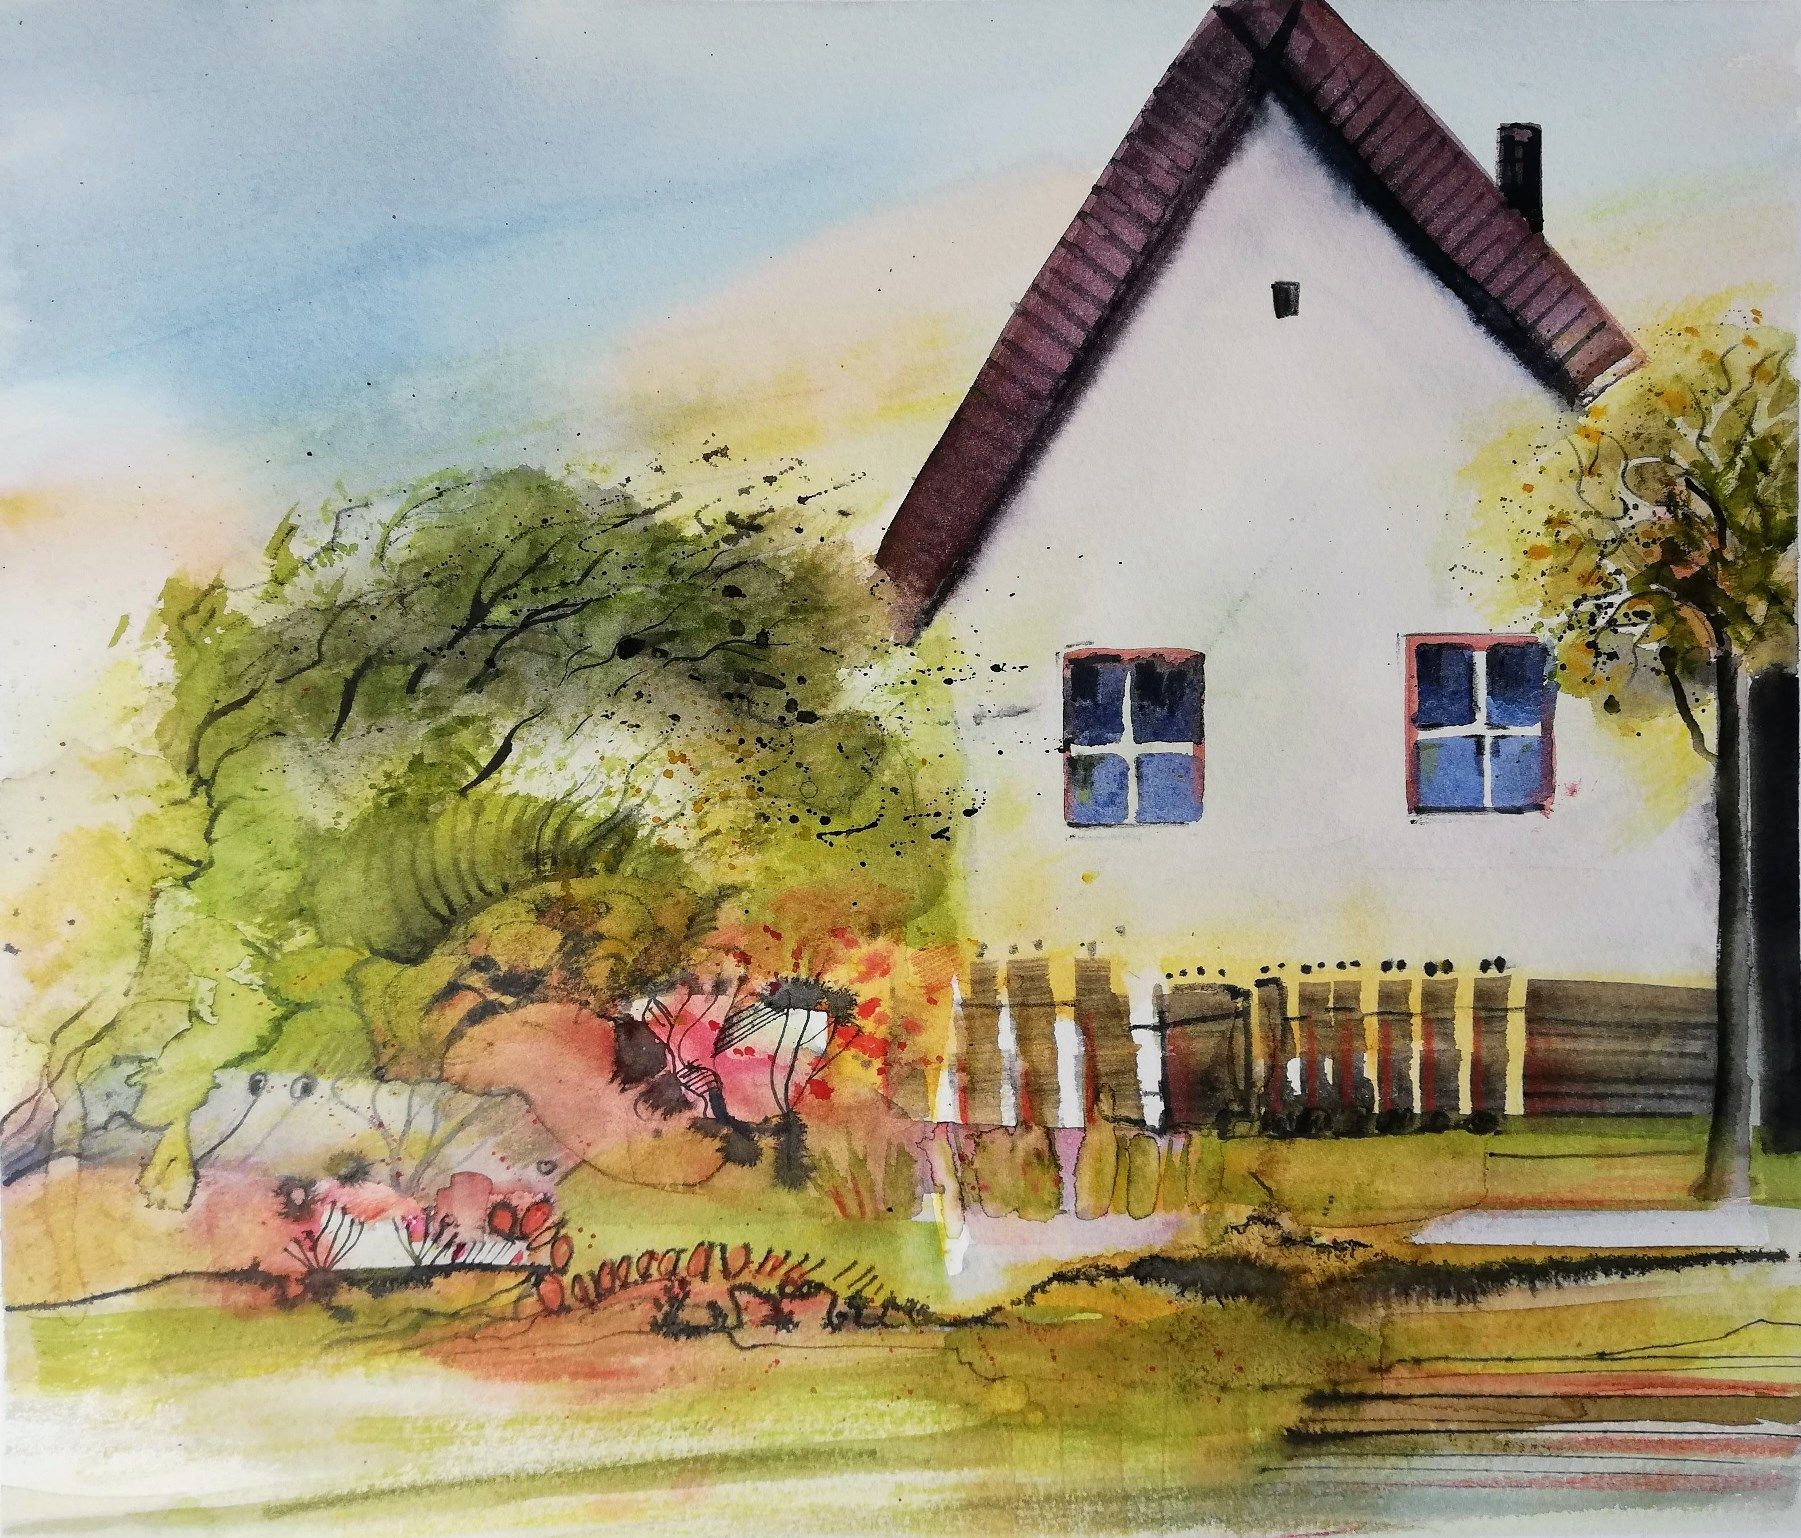 Biedermeier Aquarell Haus Und Garten Aquarell Aquarell Kunst Malerei